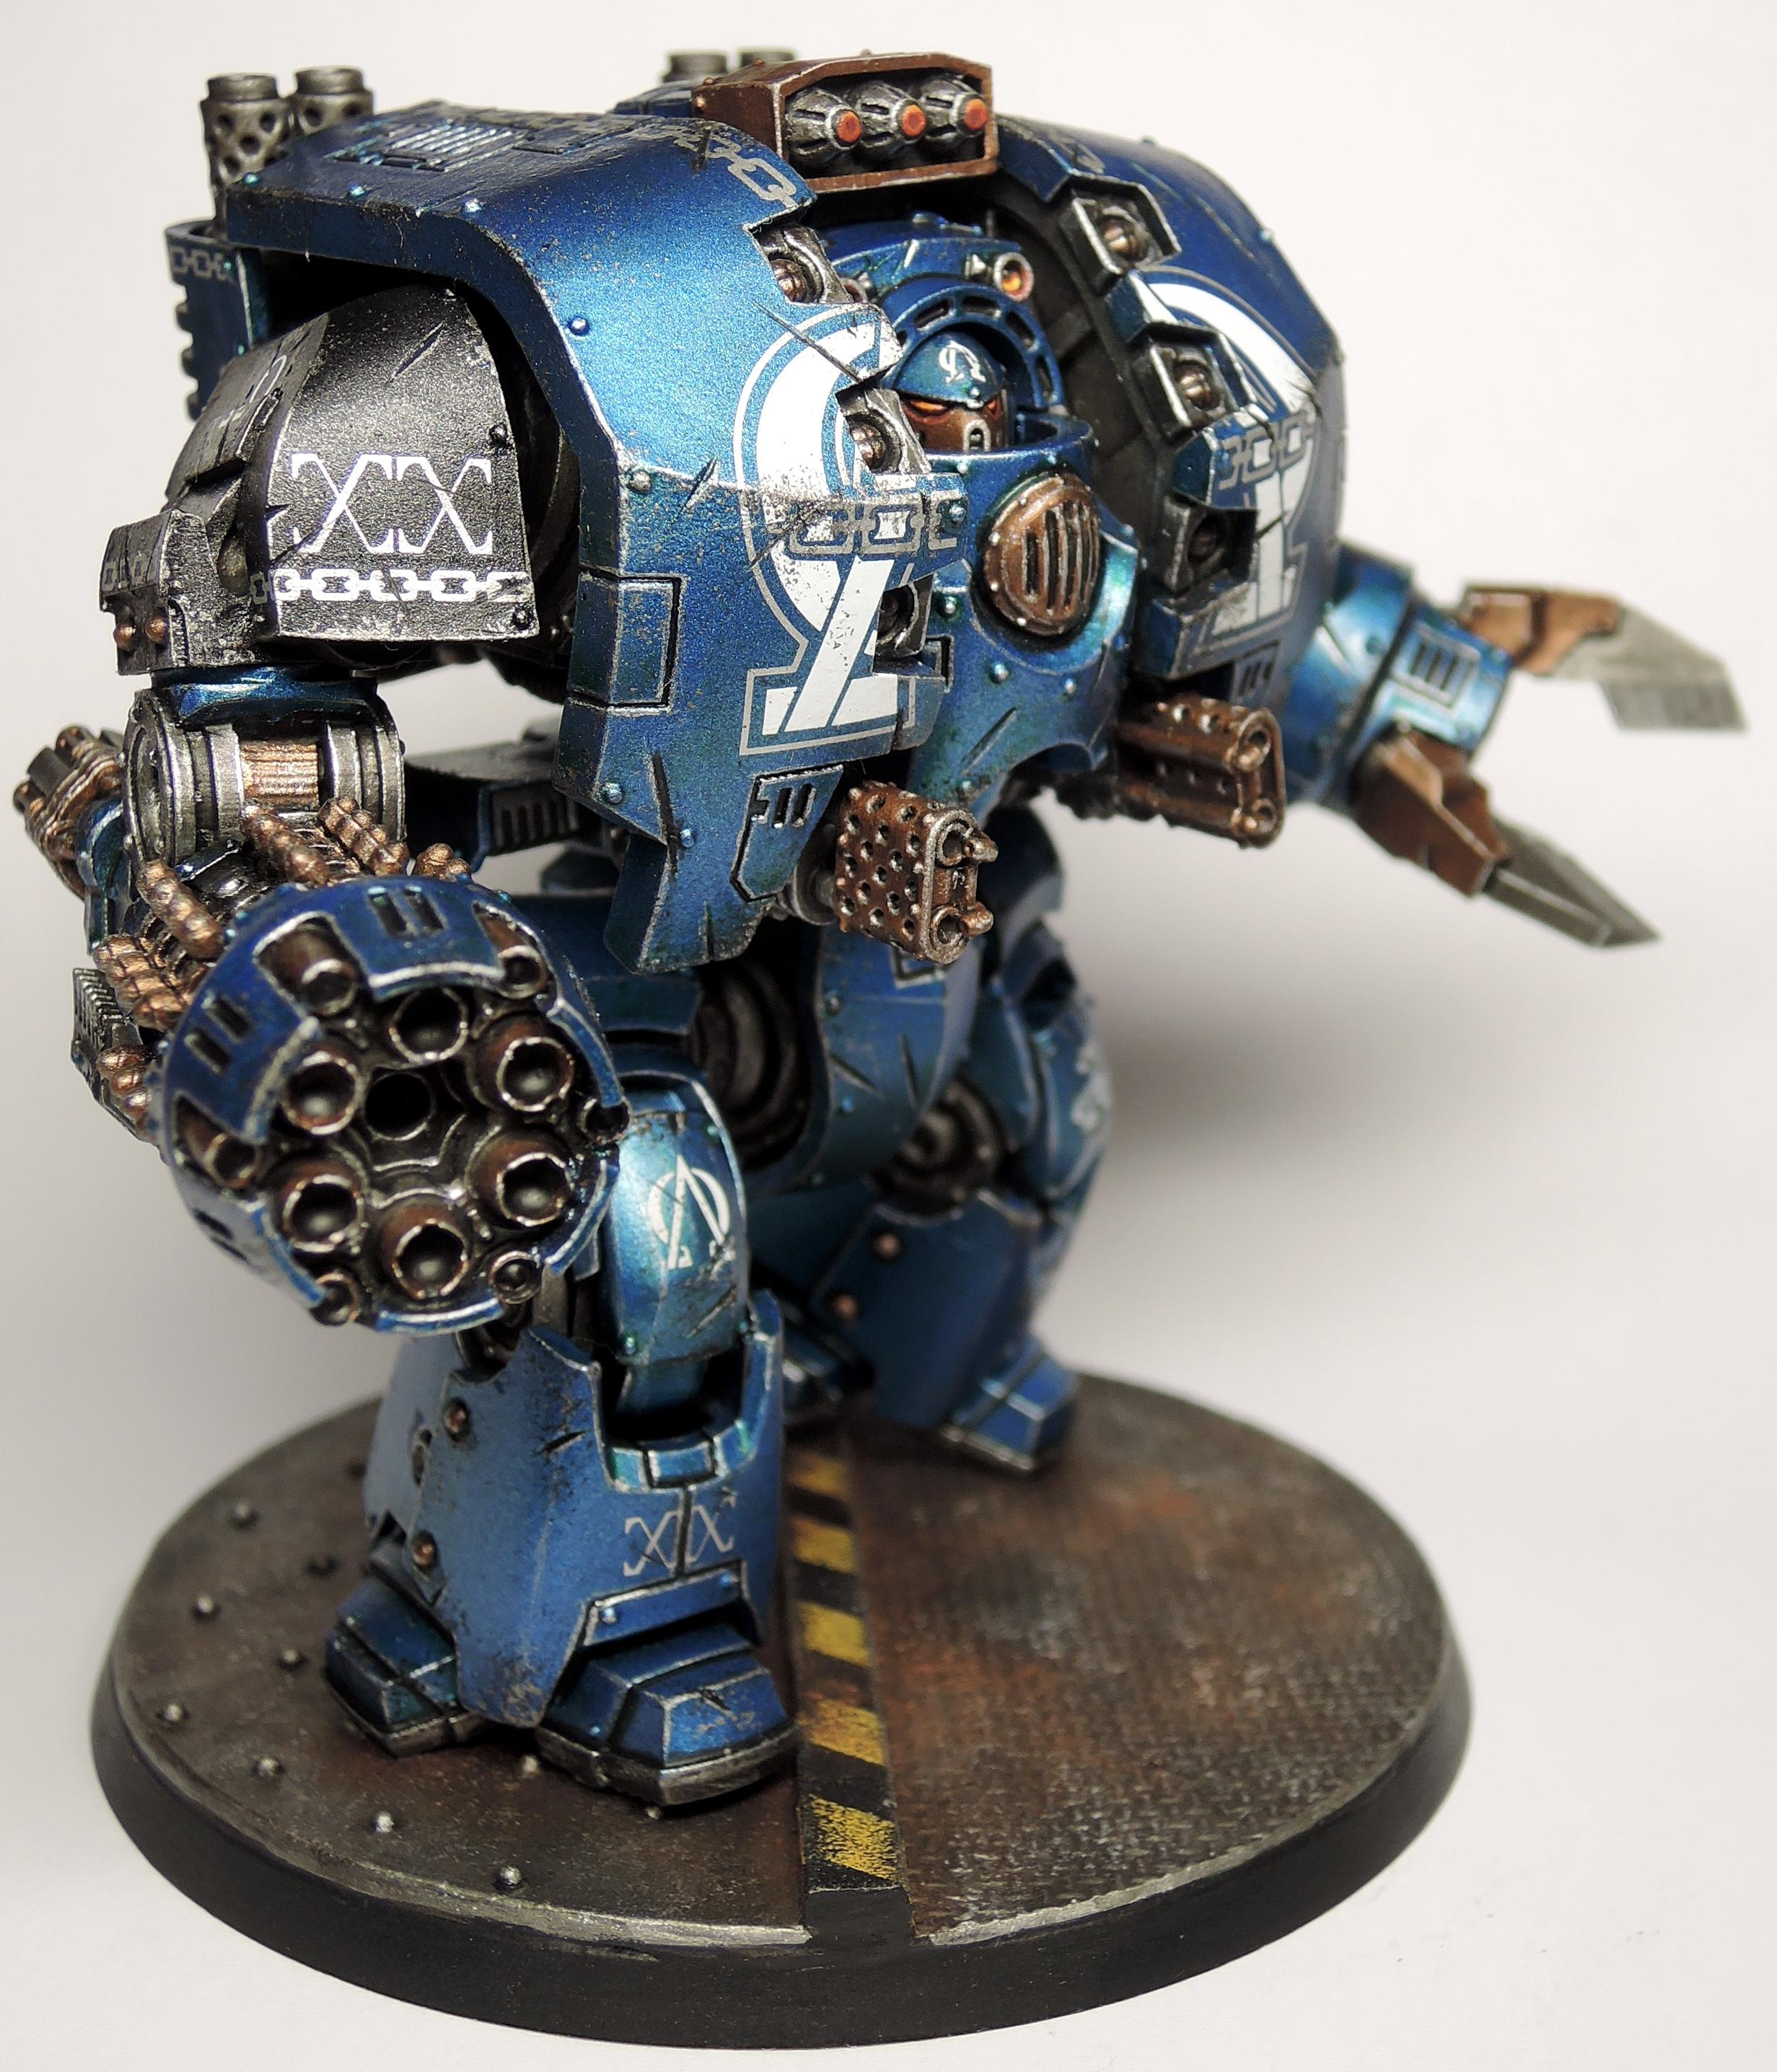 30k, Alpha Legion, Alpharius, Dreadnought, Forge World, Heresy, Horus, Kizzdougs, Leviathan, Metallic, Prospero, Space Marines, Xx